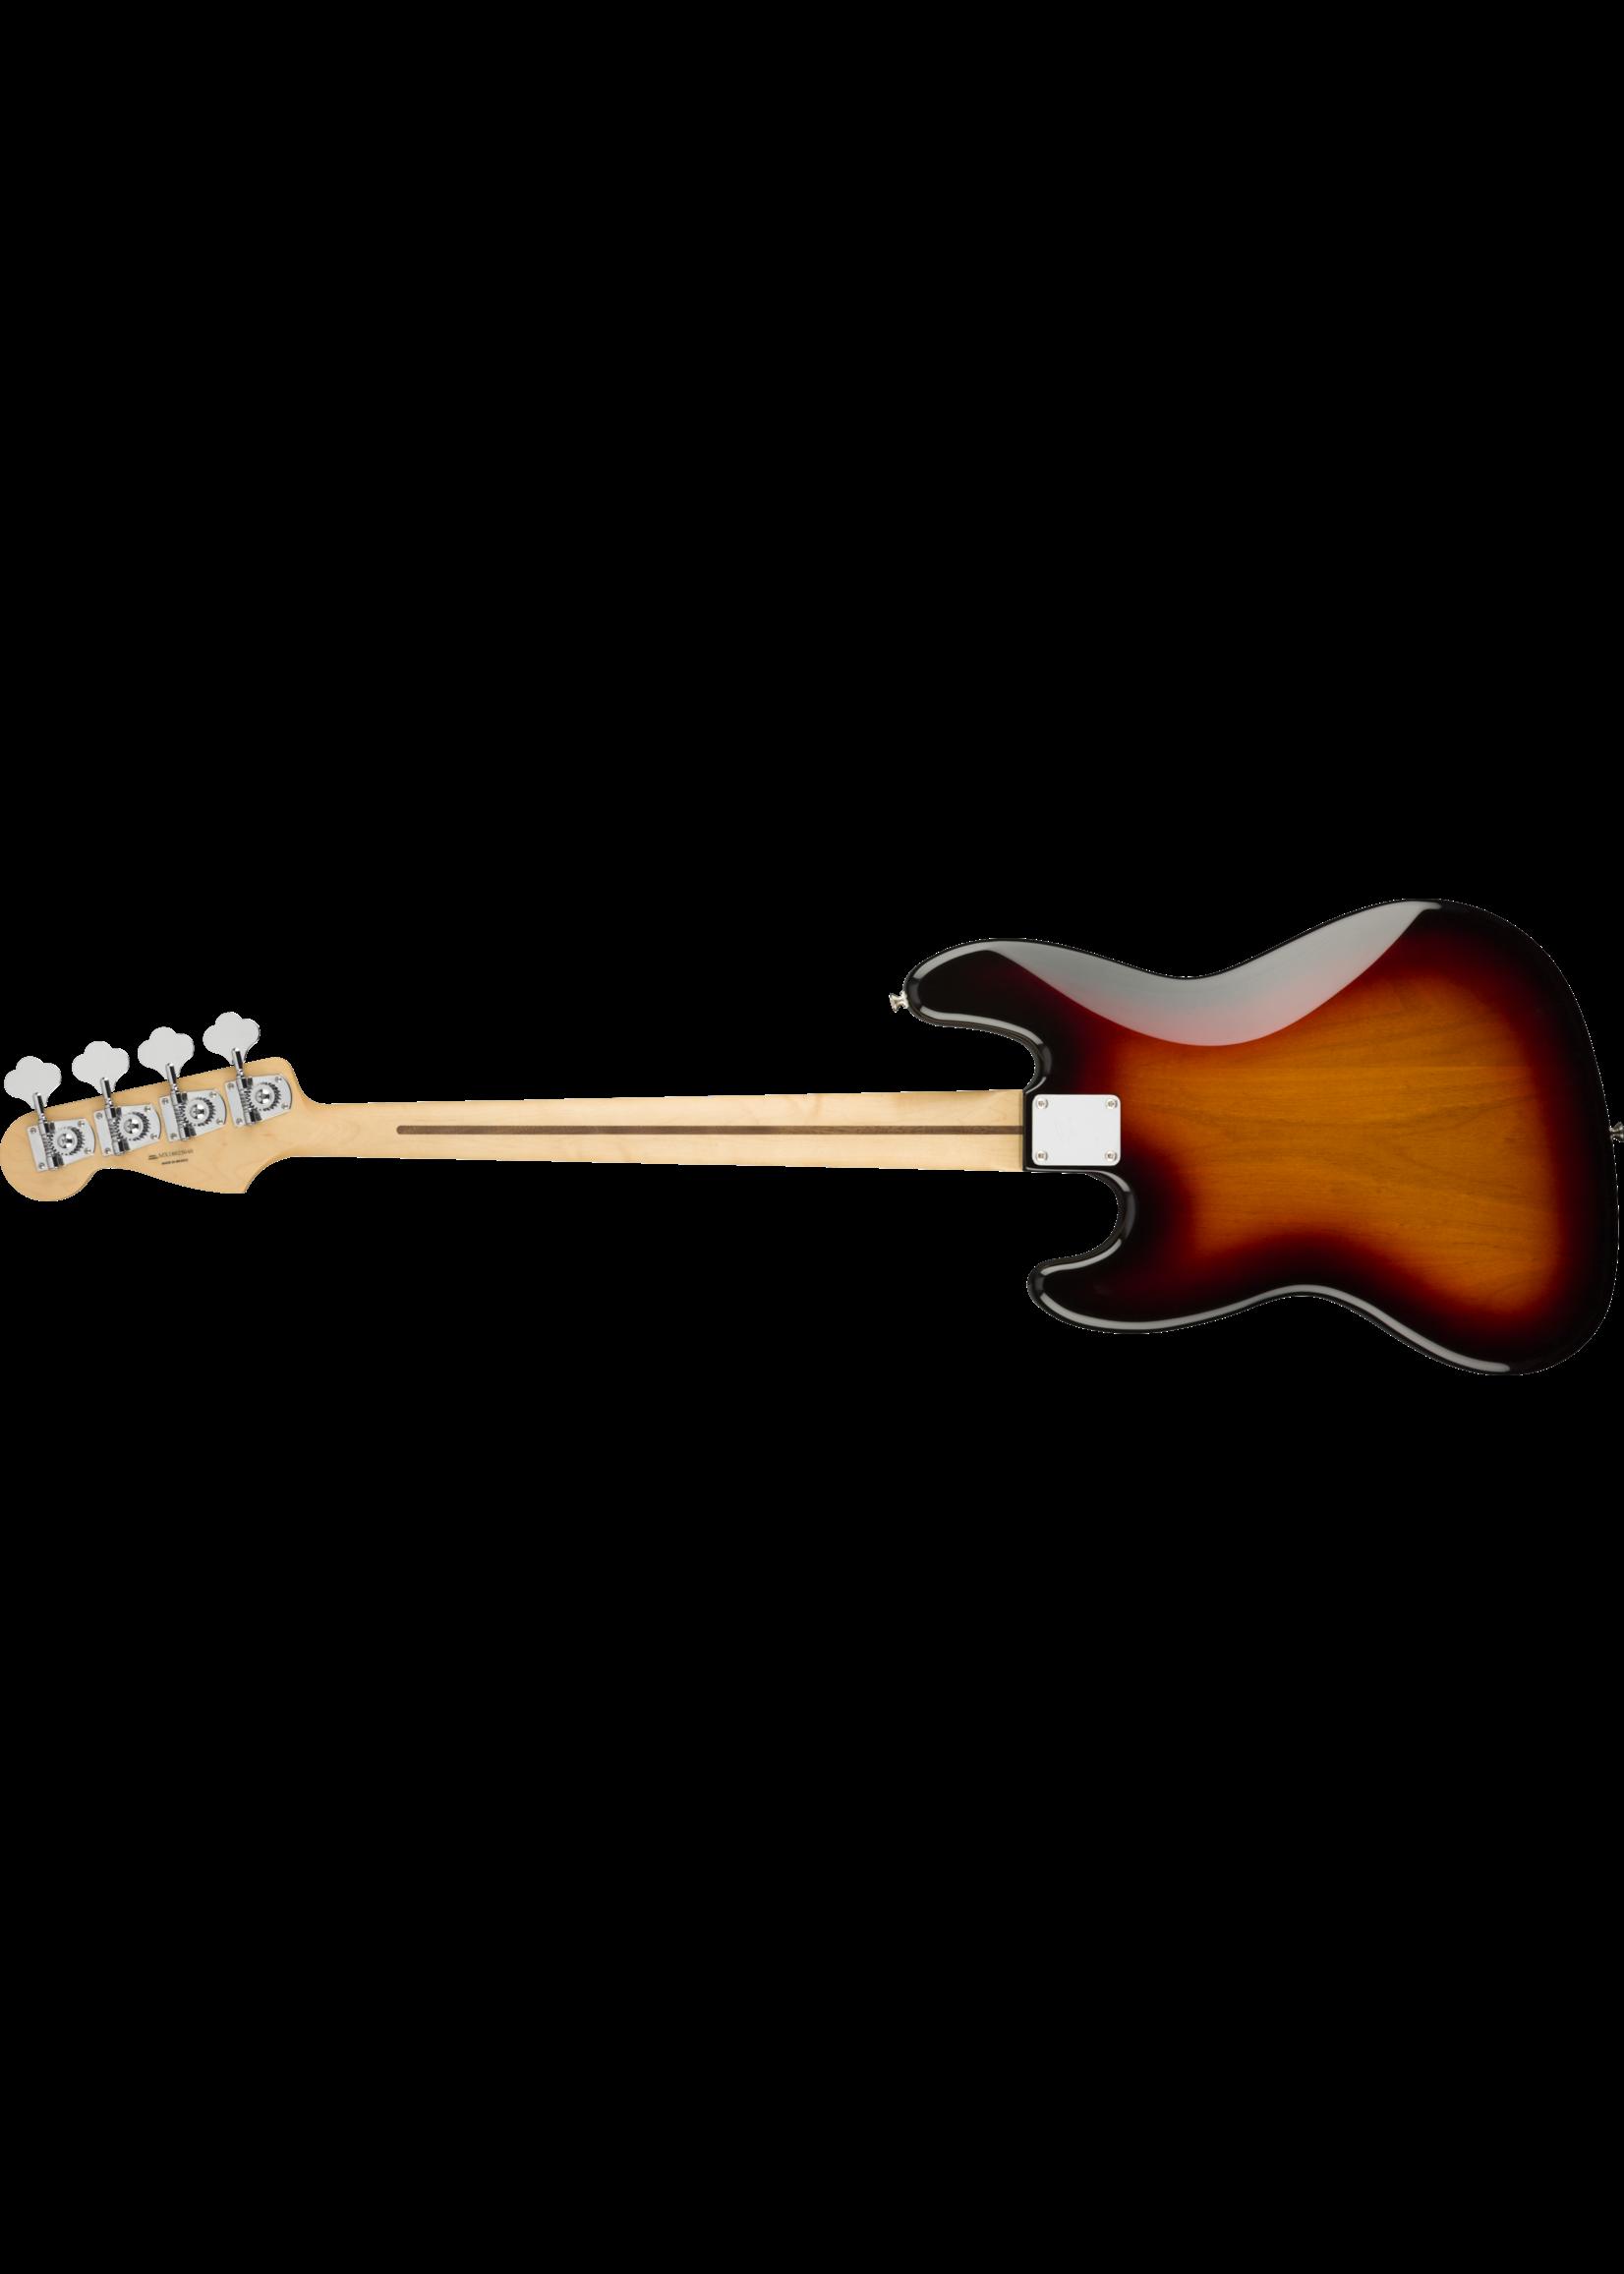 Fender Fender Player Jazz Bass with Pau Ferro Fretboard 3-Color Sunburst